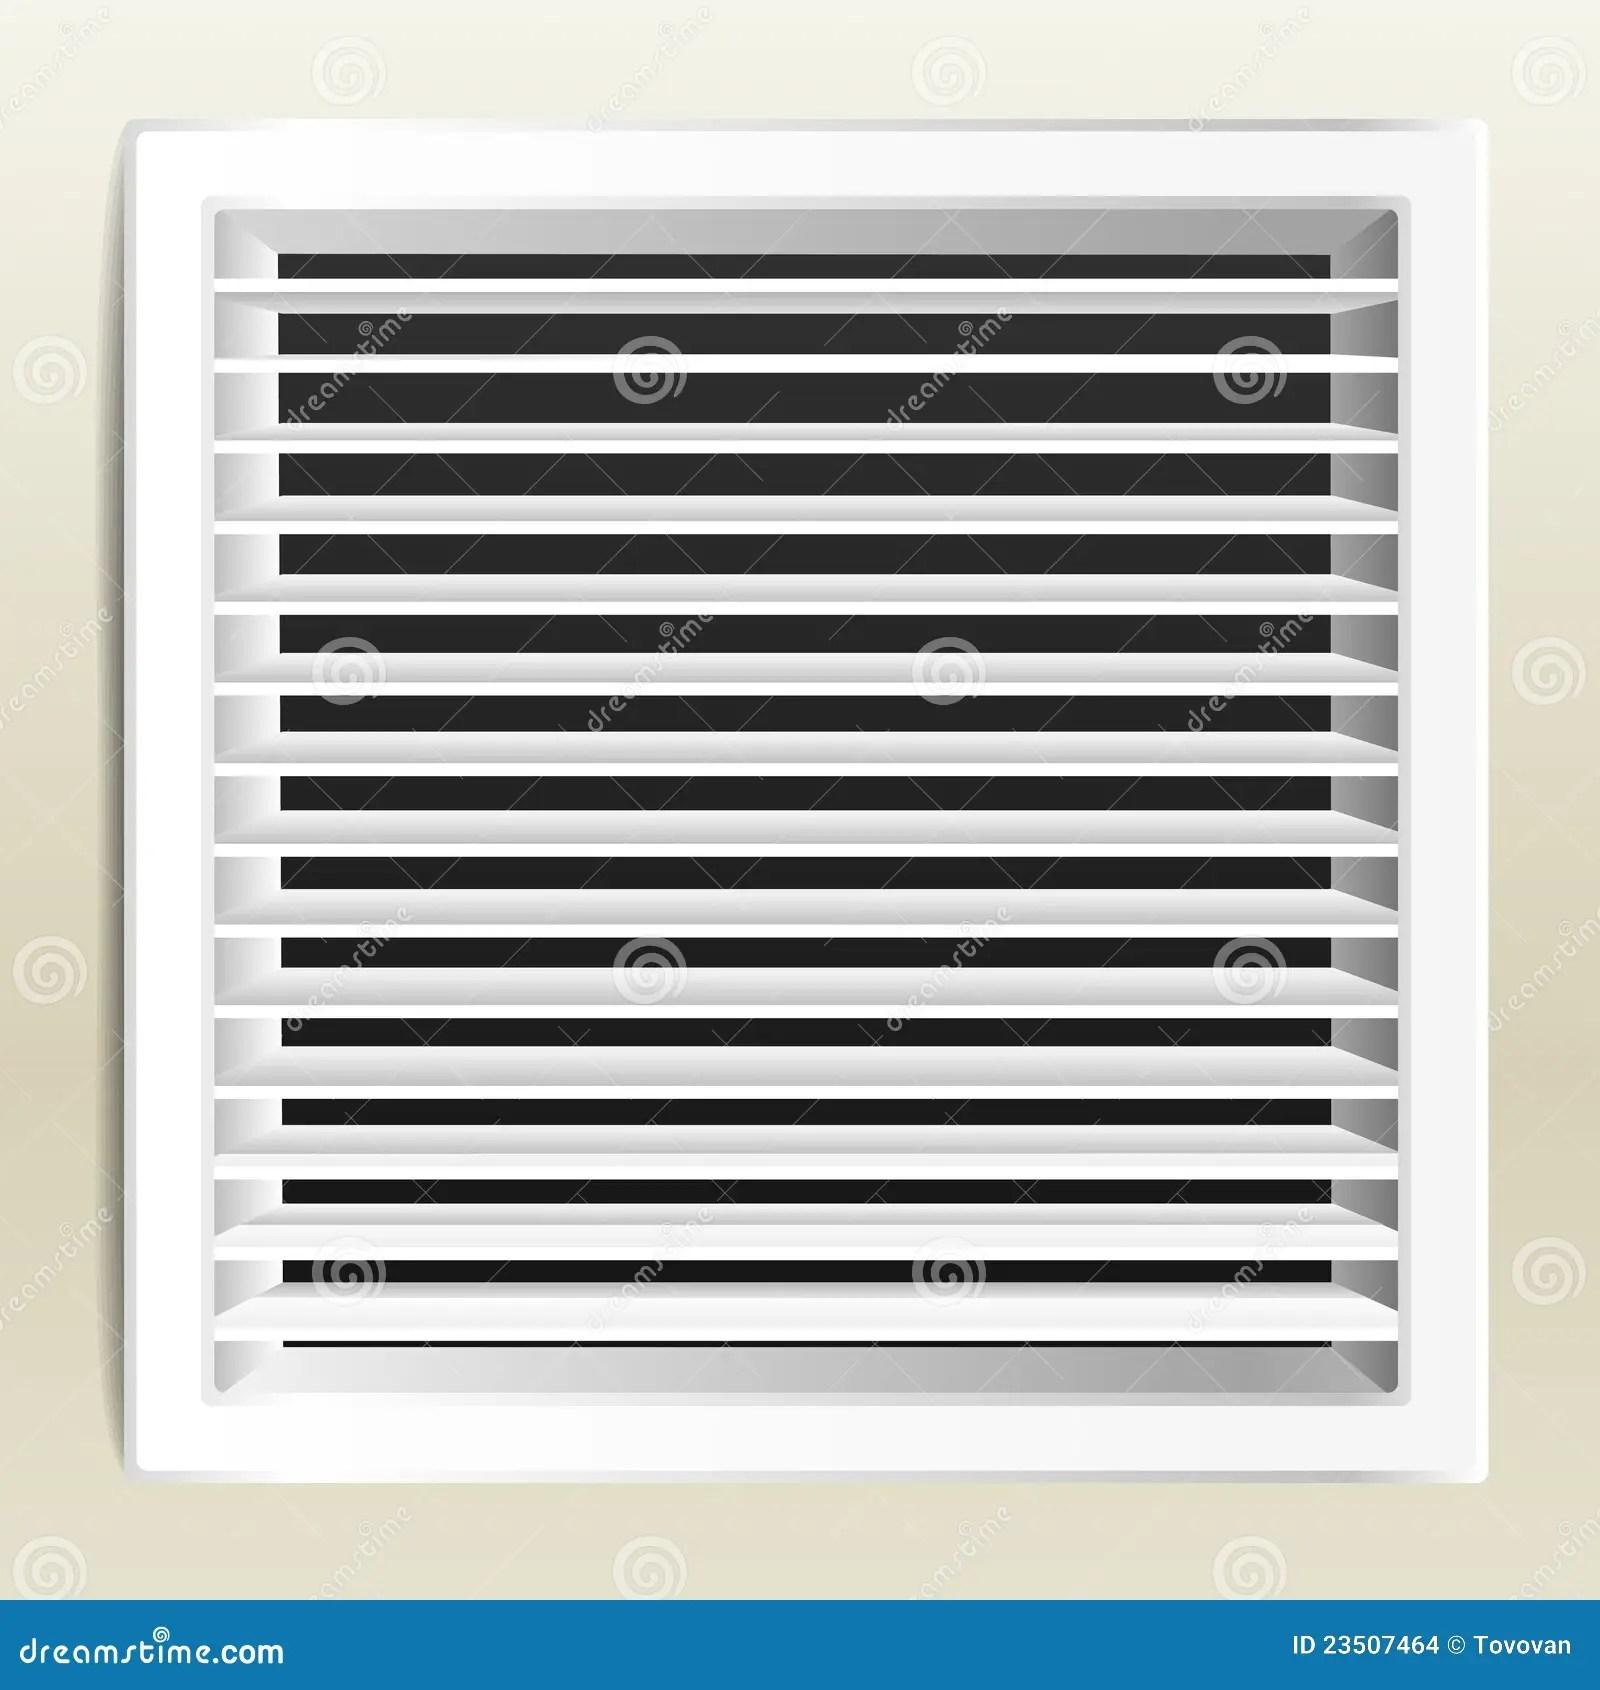 kitchen exhaust vent red appliances ventilation window stock images - image: 23507464